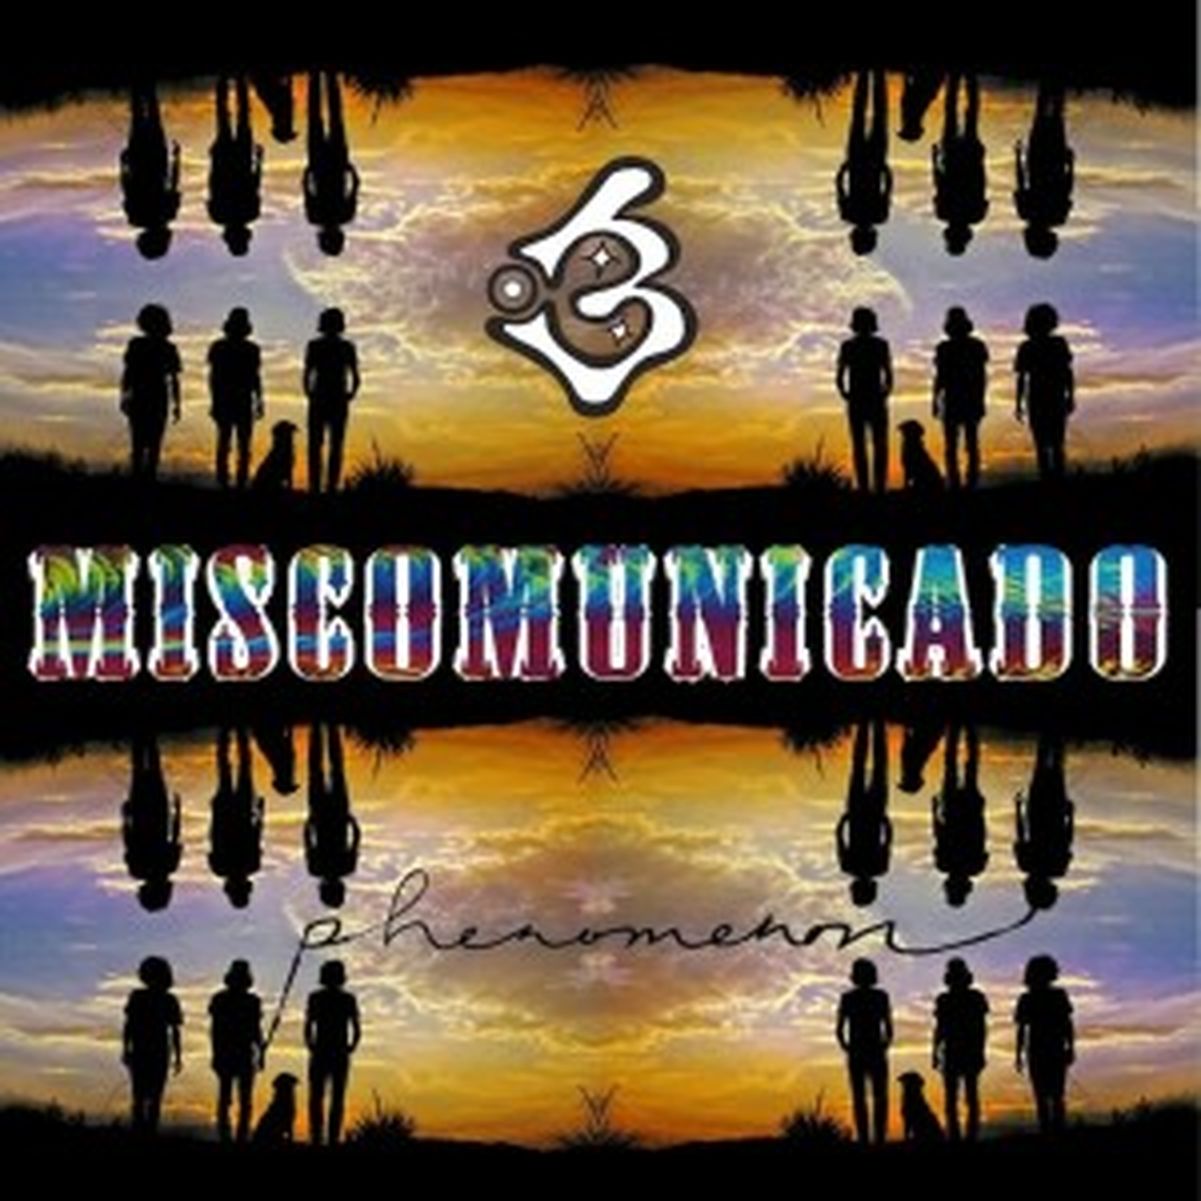 MISCOMUNICADO wiki, MISCOMUNICADO review, MISCOMUNICADO history, MISCOMUNICADO news